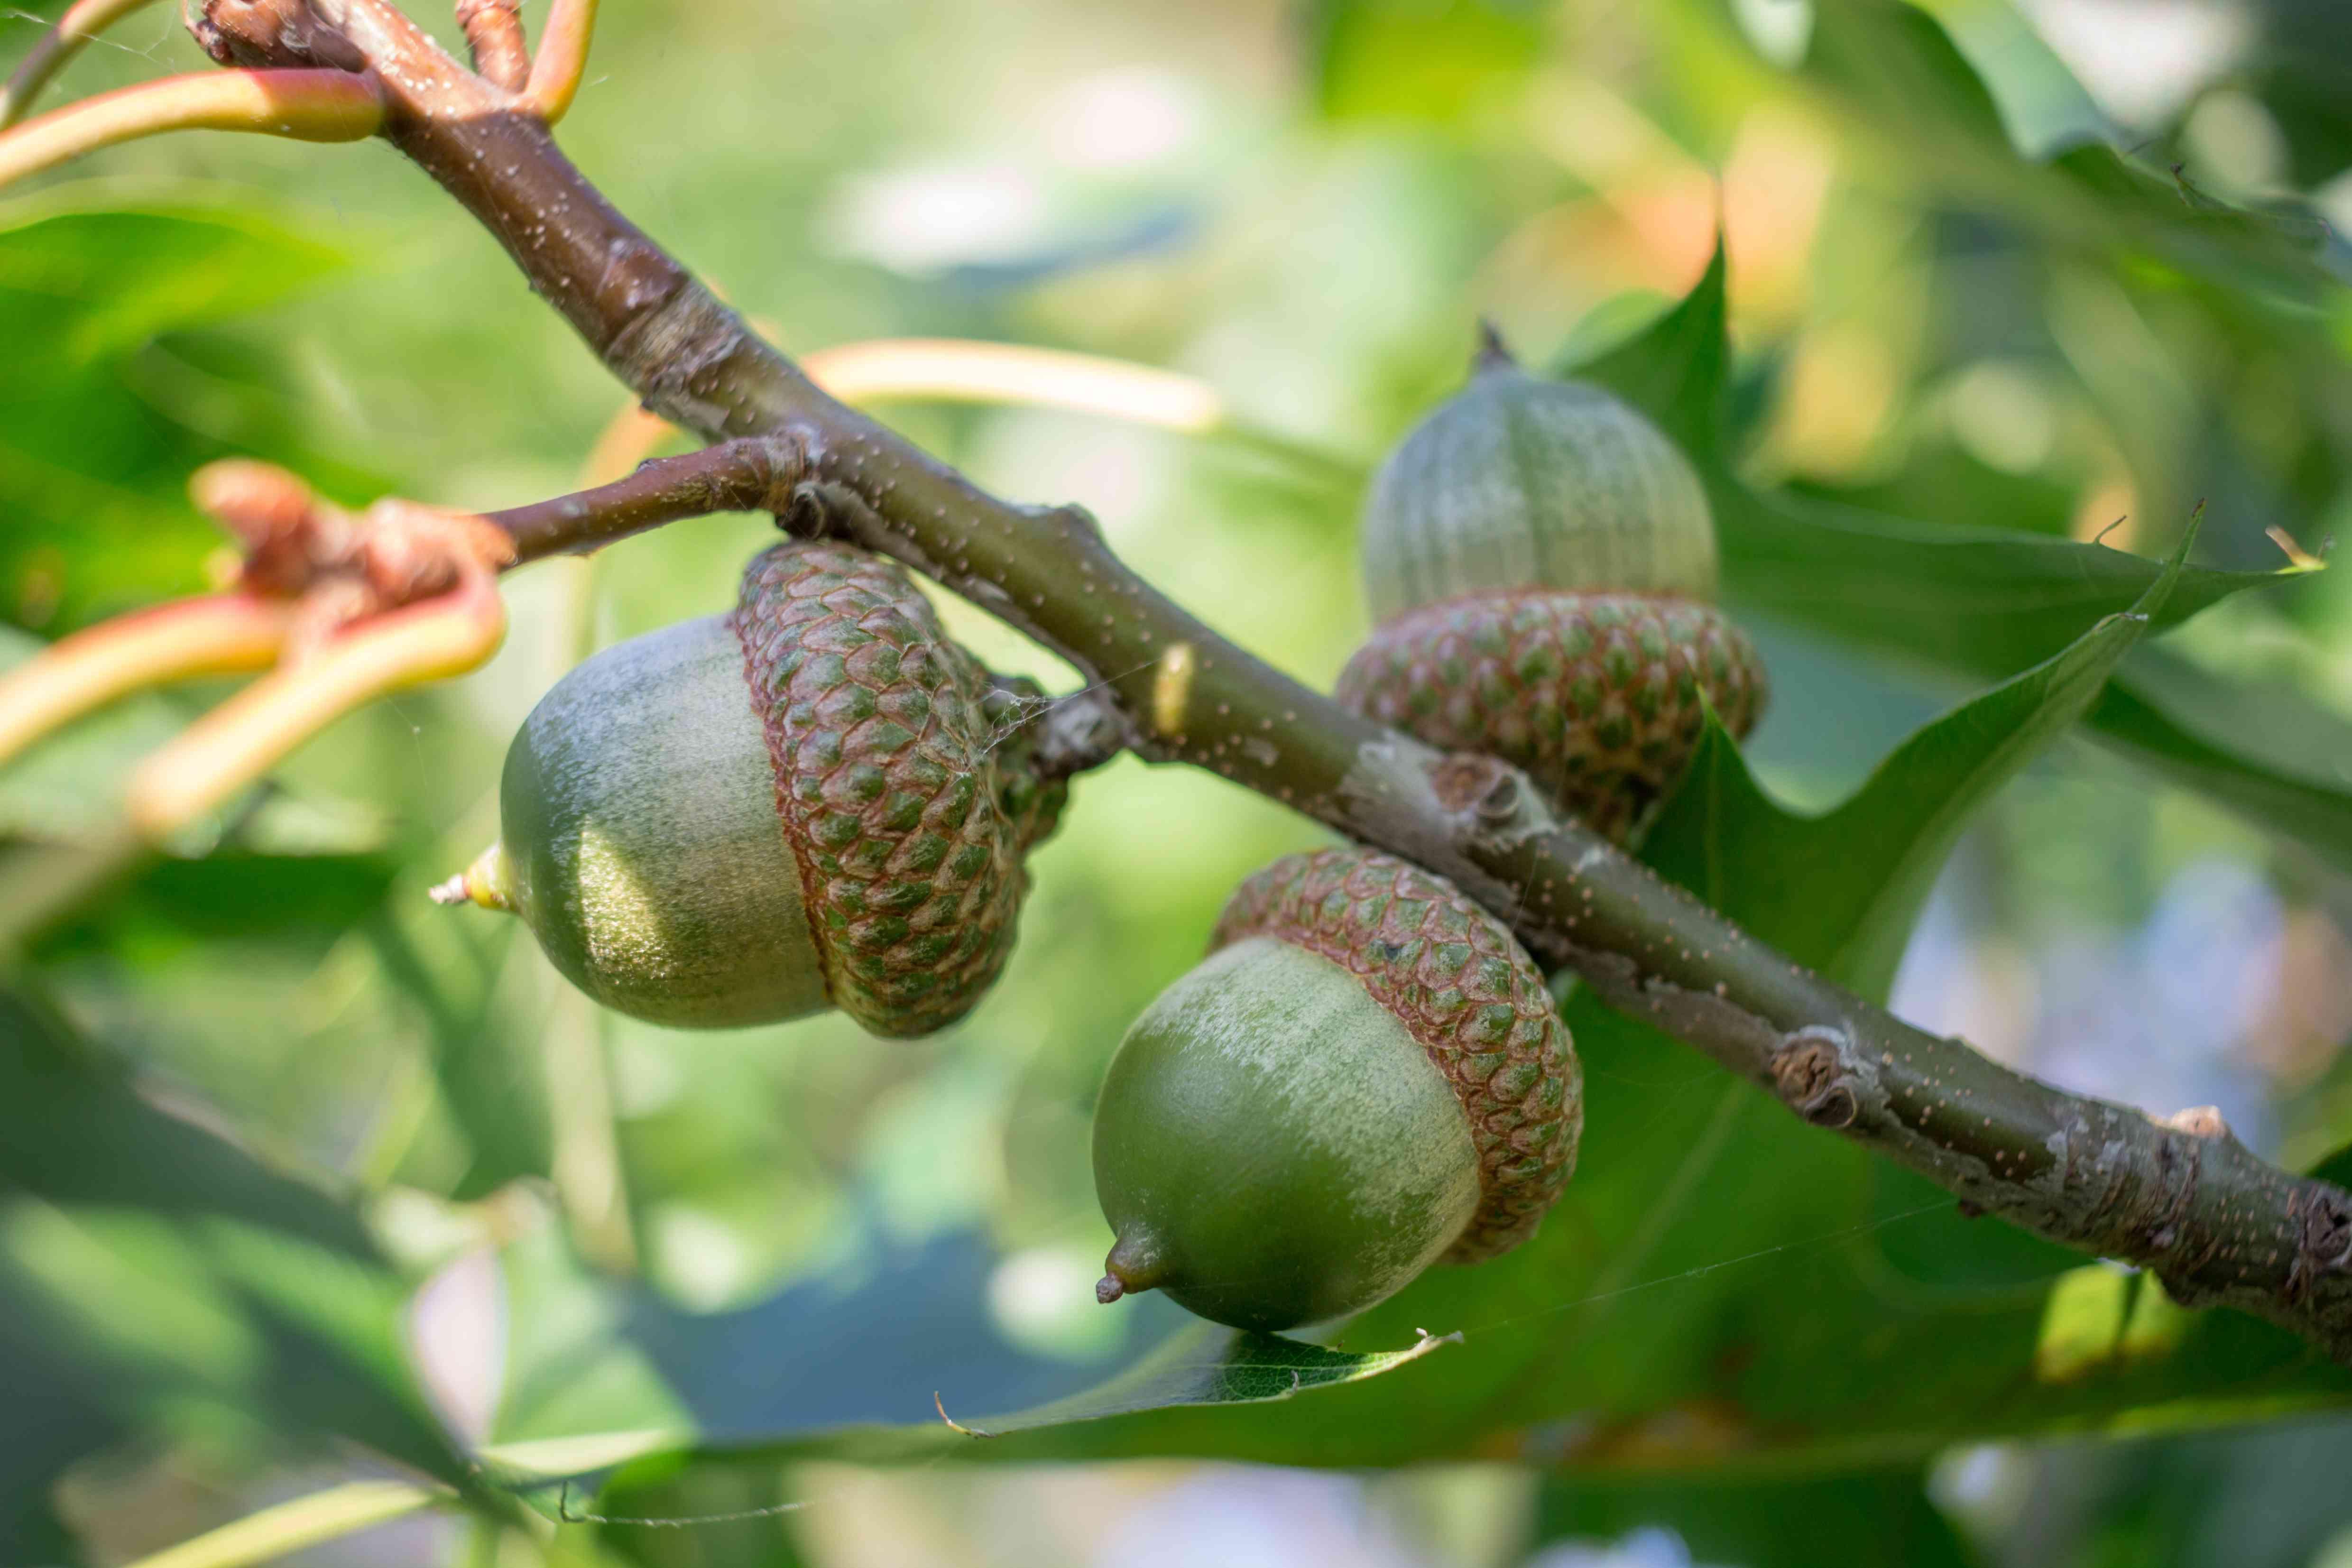 Three green acorn nuts on laurel oak tree branches